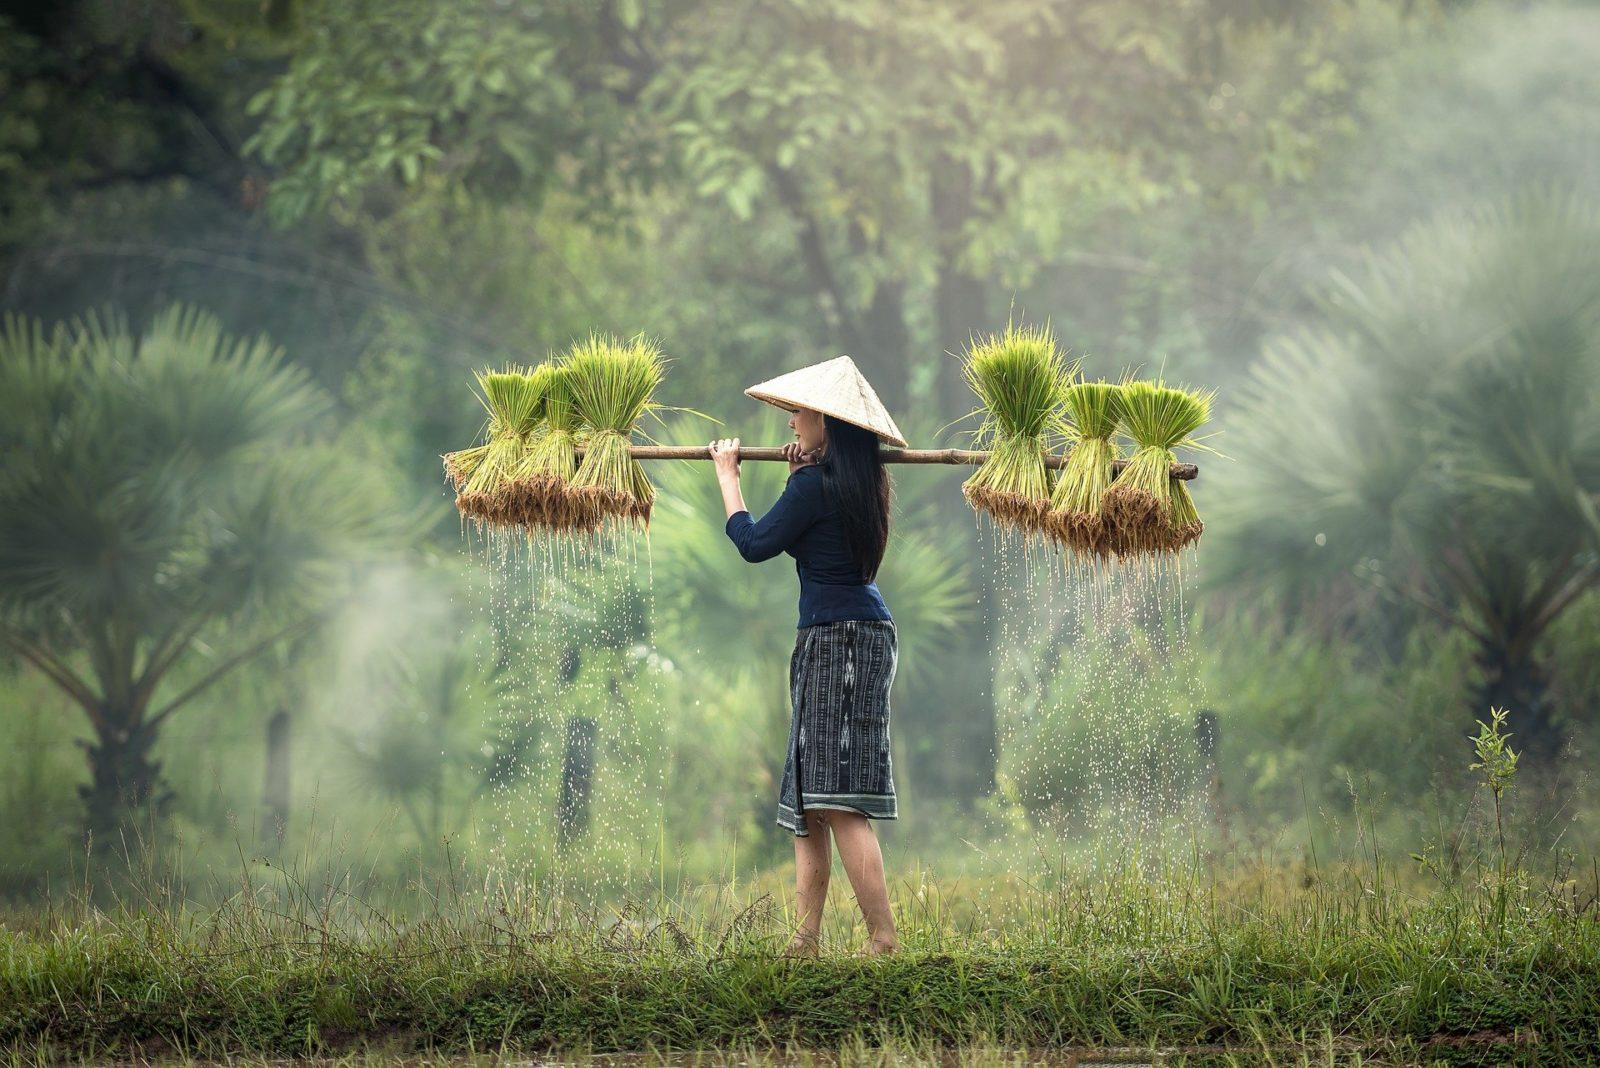 Eurostar Commodities warns a global shortage of rice flour